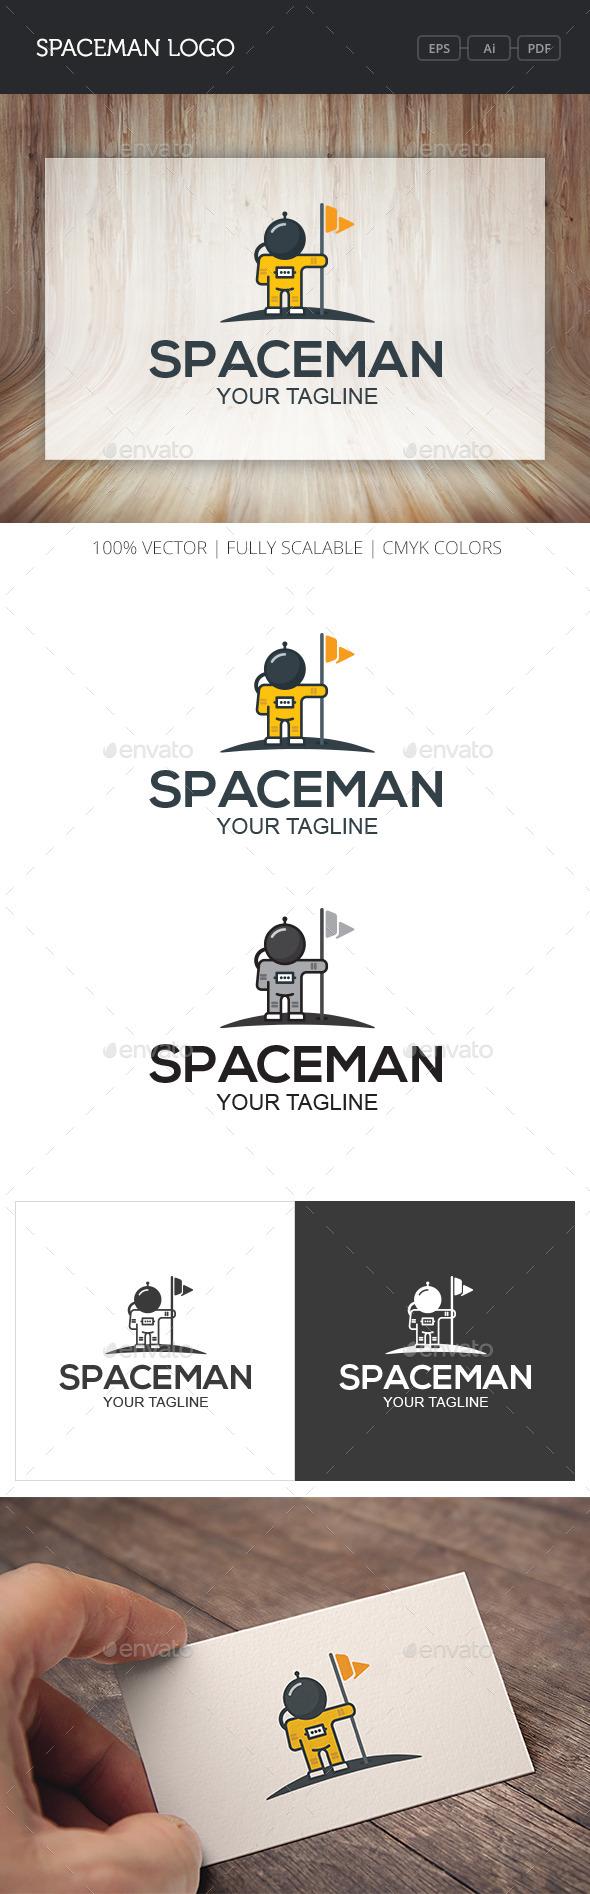 GraphicRiver Spaceman Logo 10754433